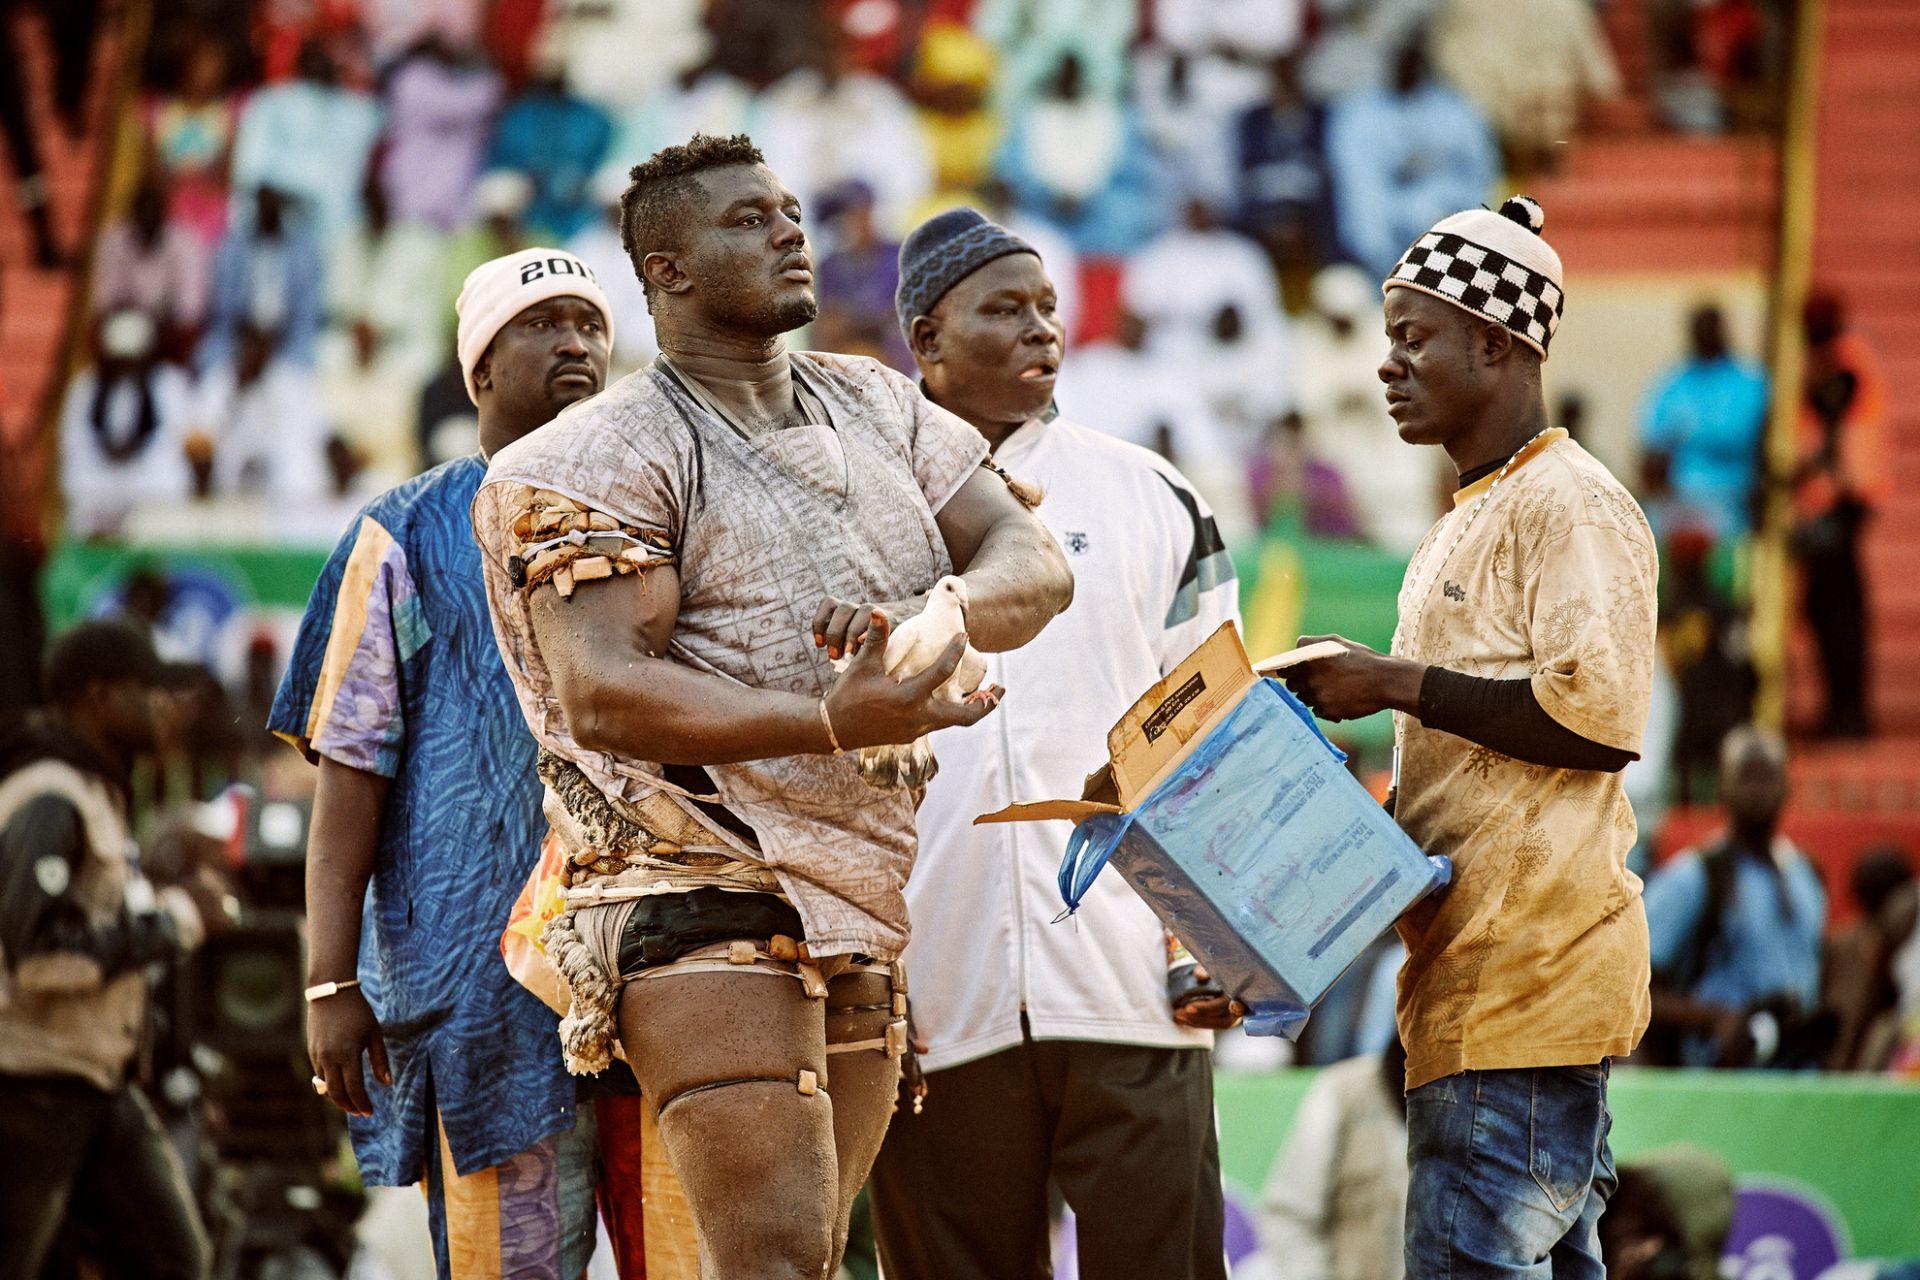 The Gris Gris Wrestlers of Senegal - 6